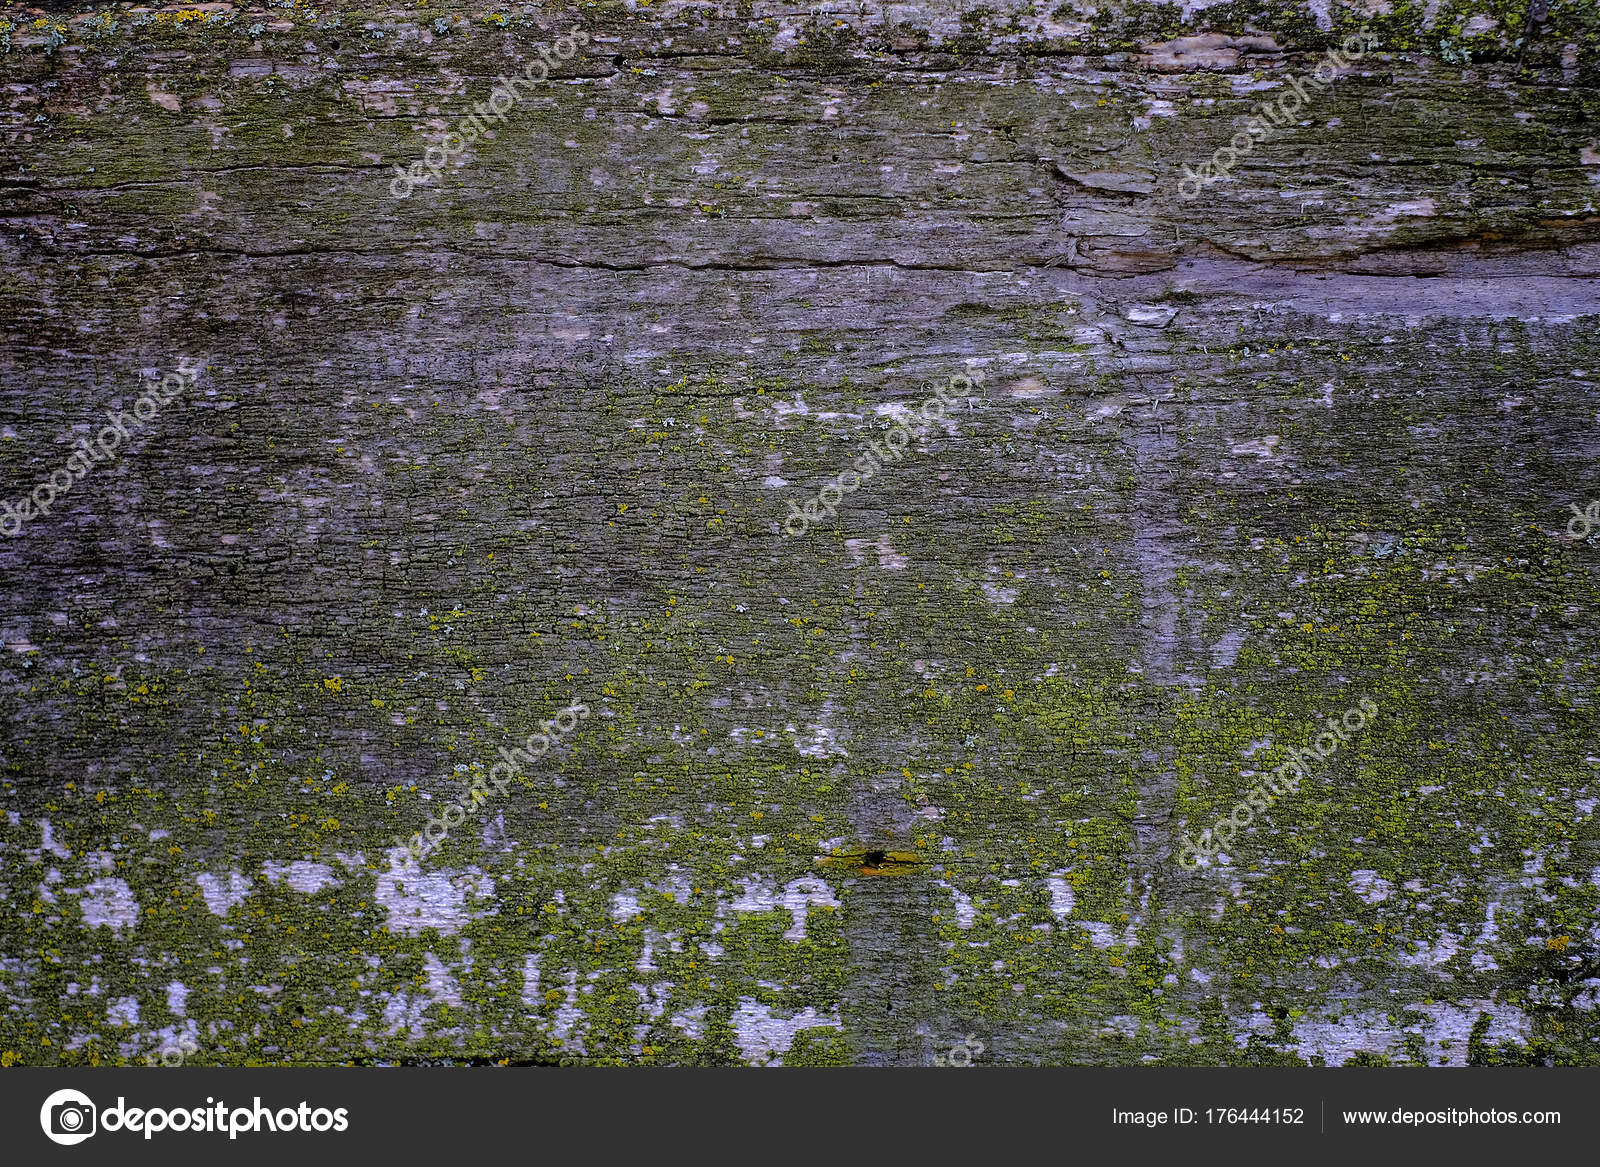 Braun Holz Textur. Abstrakt, leere Vorlage — Stockfoto © hayoshka ...